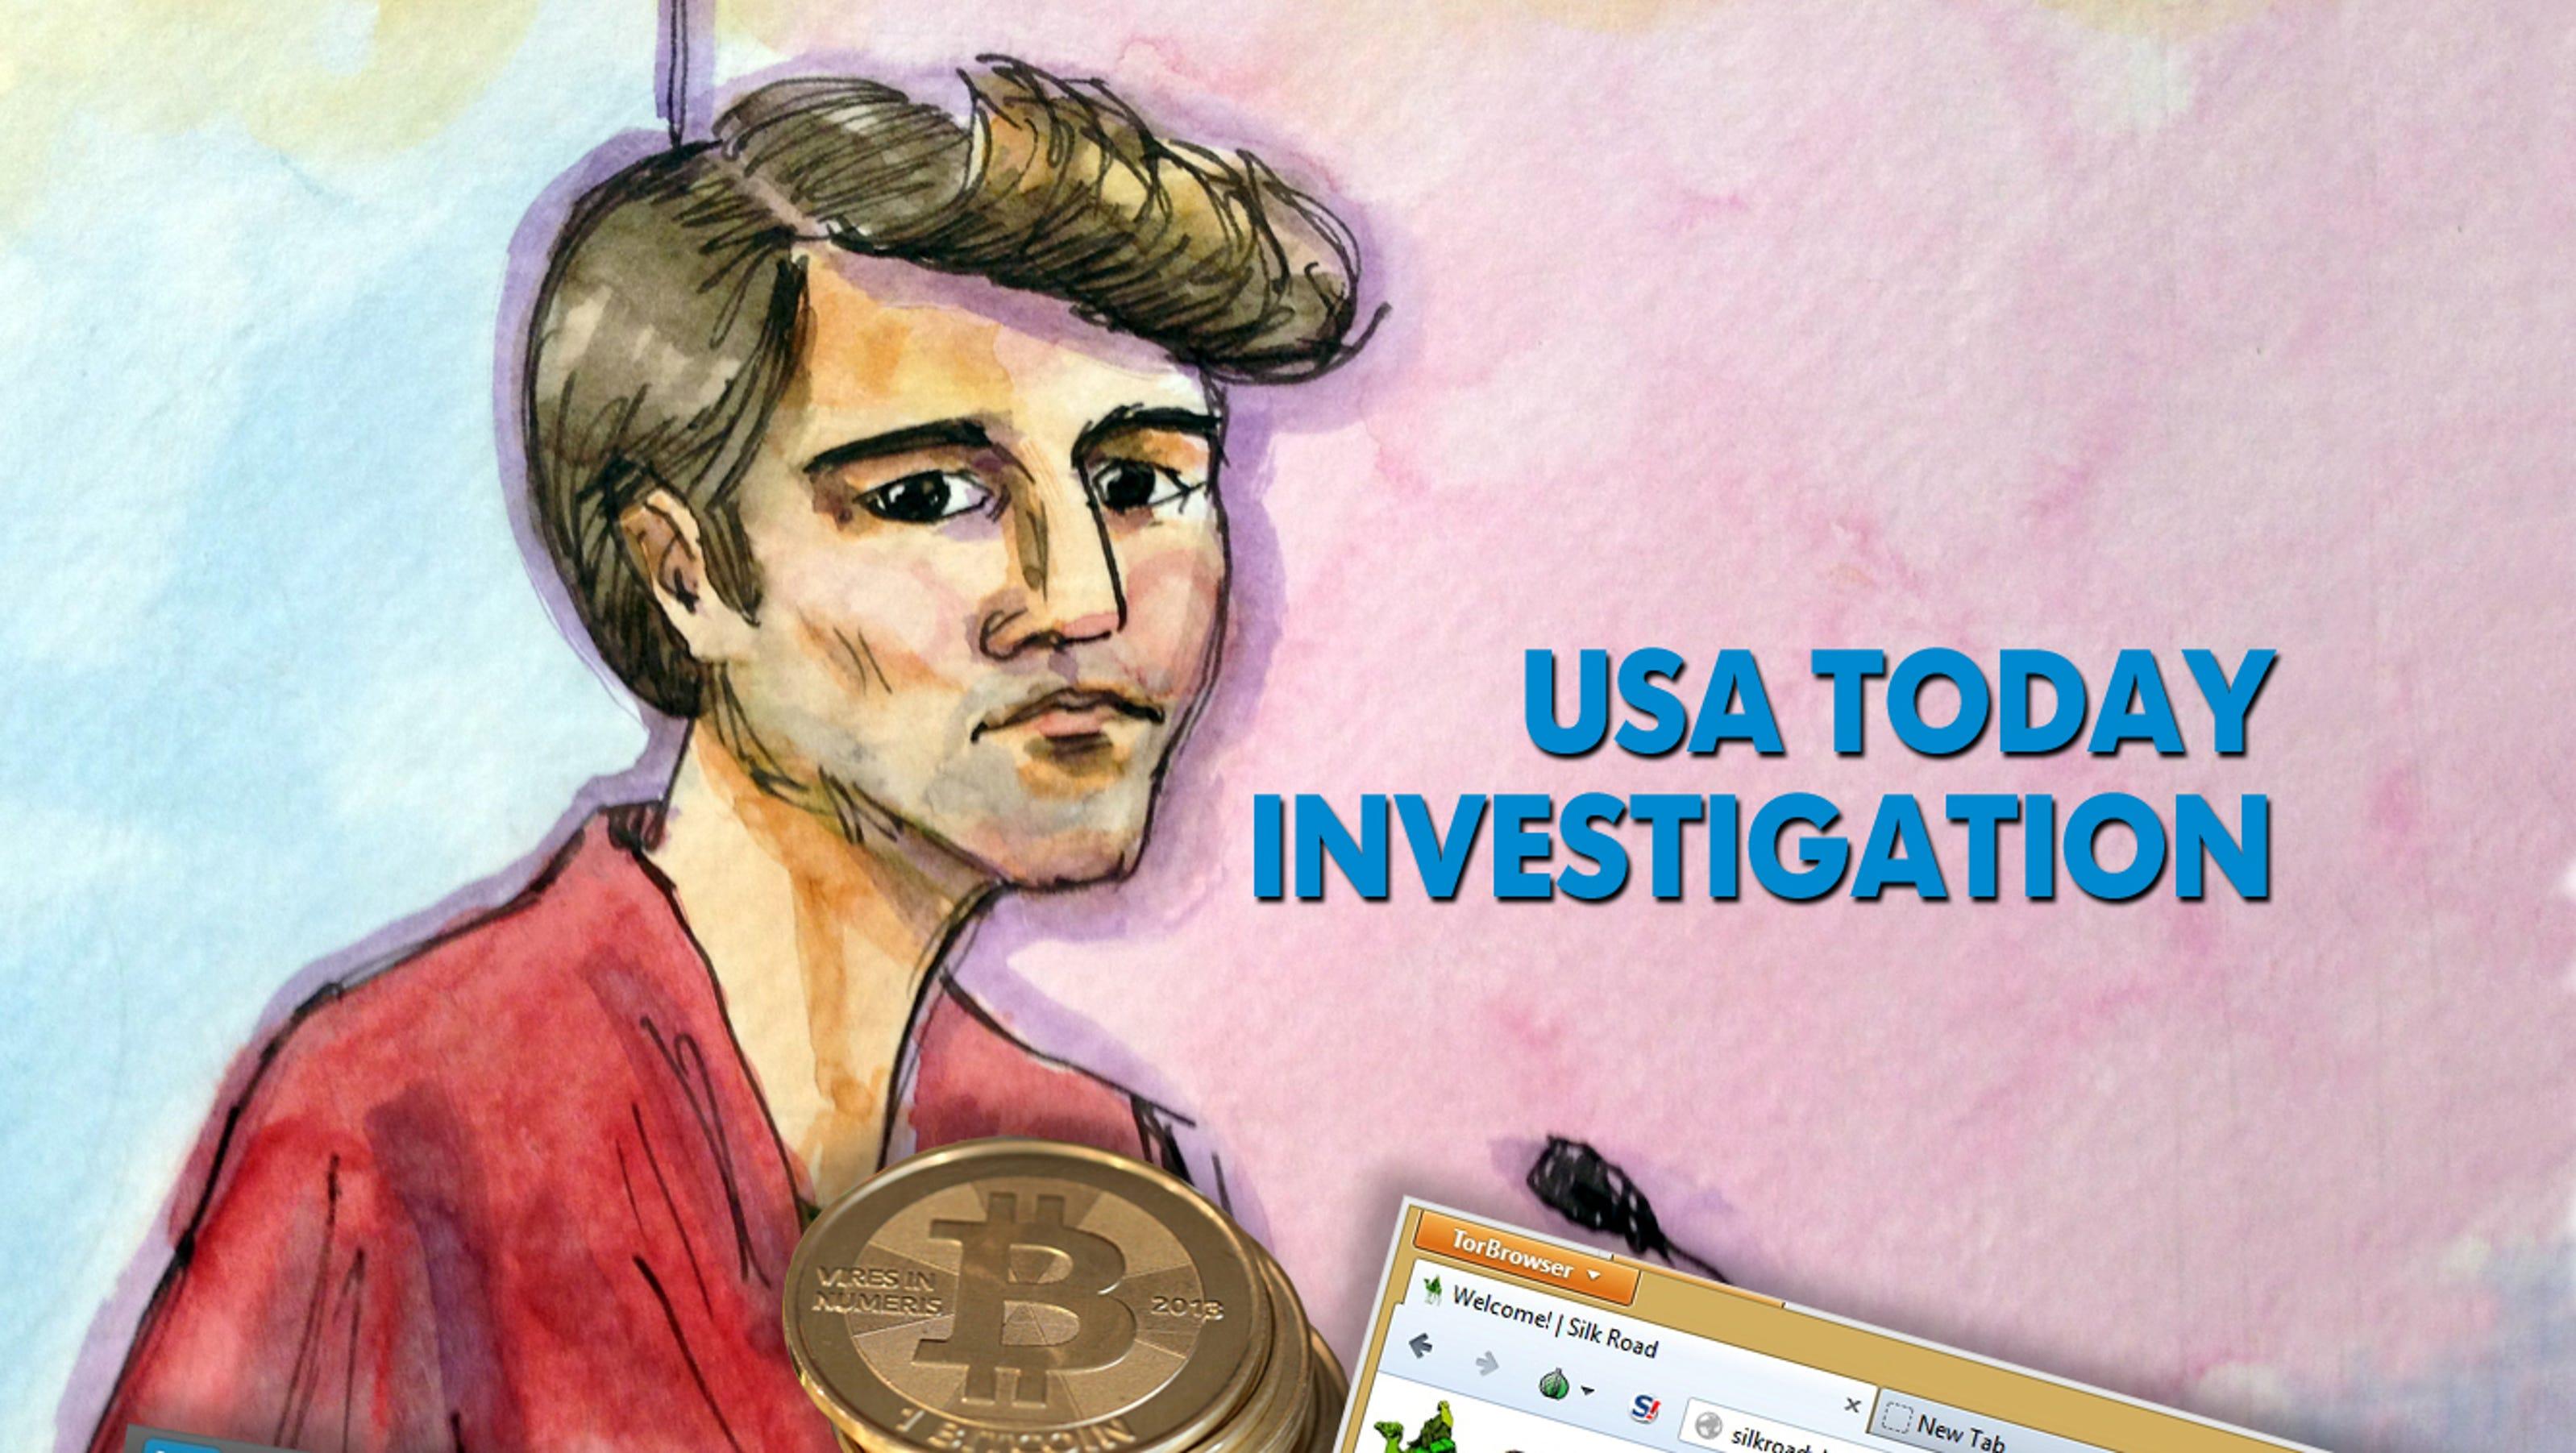 How FBI brought down cyber-underworld site Silk Road